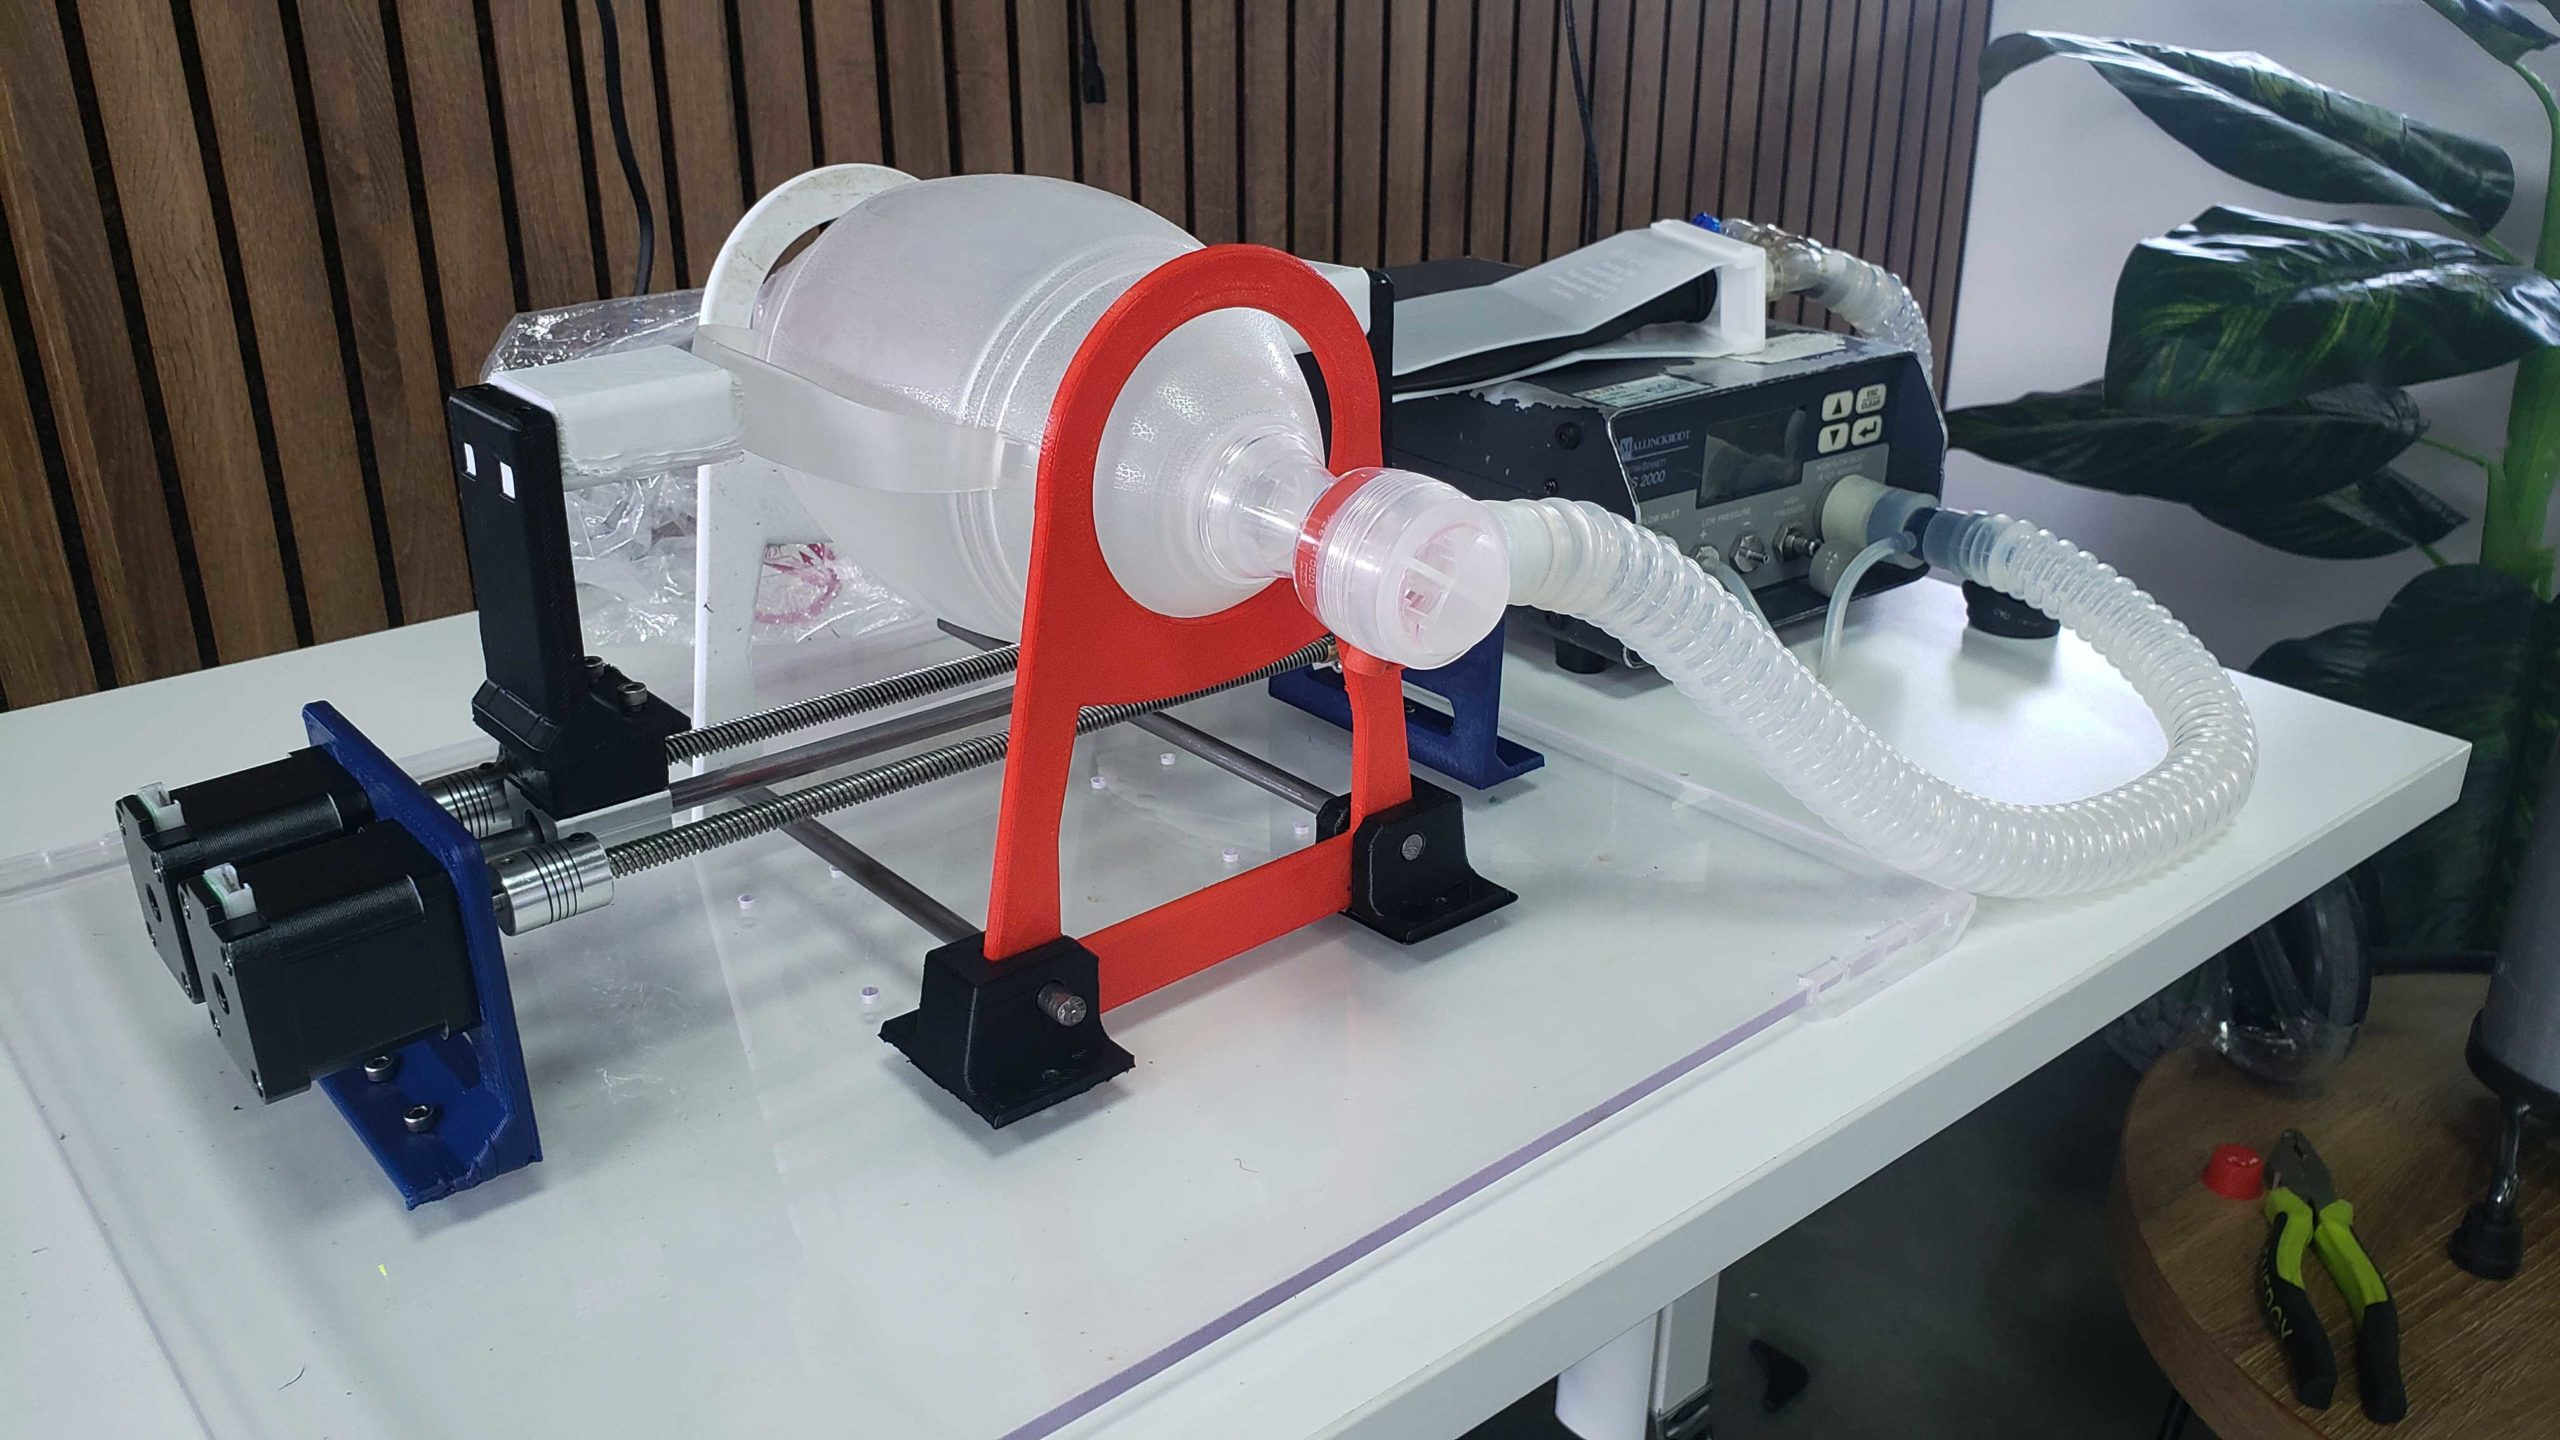 Crean en Cali respirador mecánico funcional en 3D que alivianaría déficit en hospitales